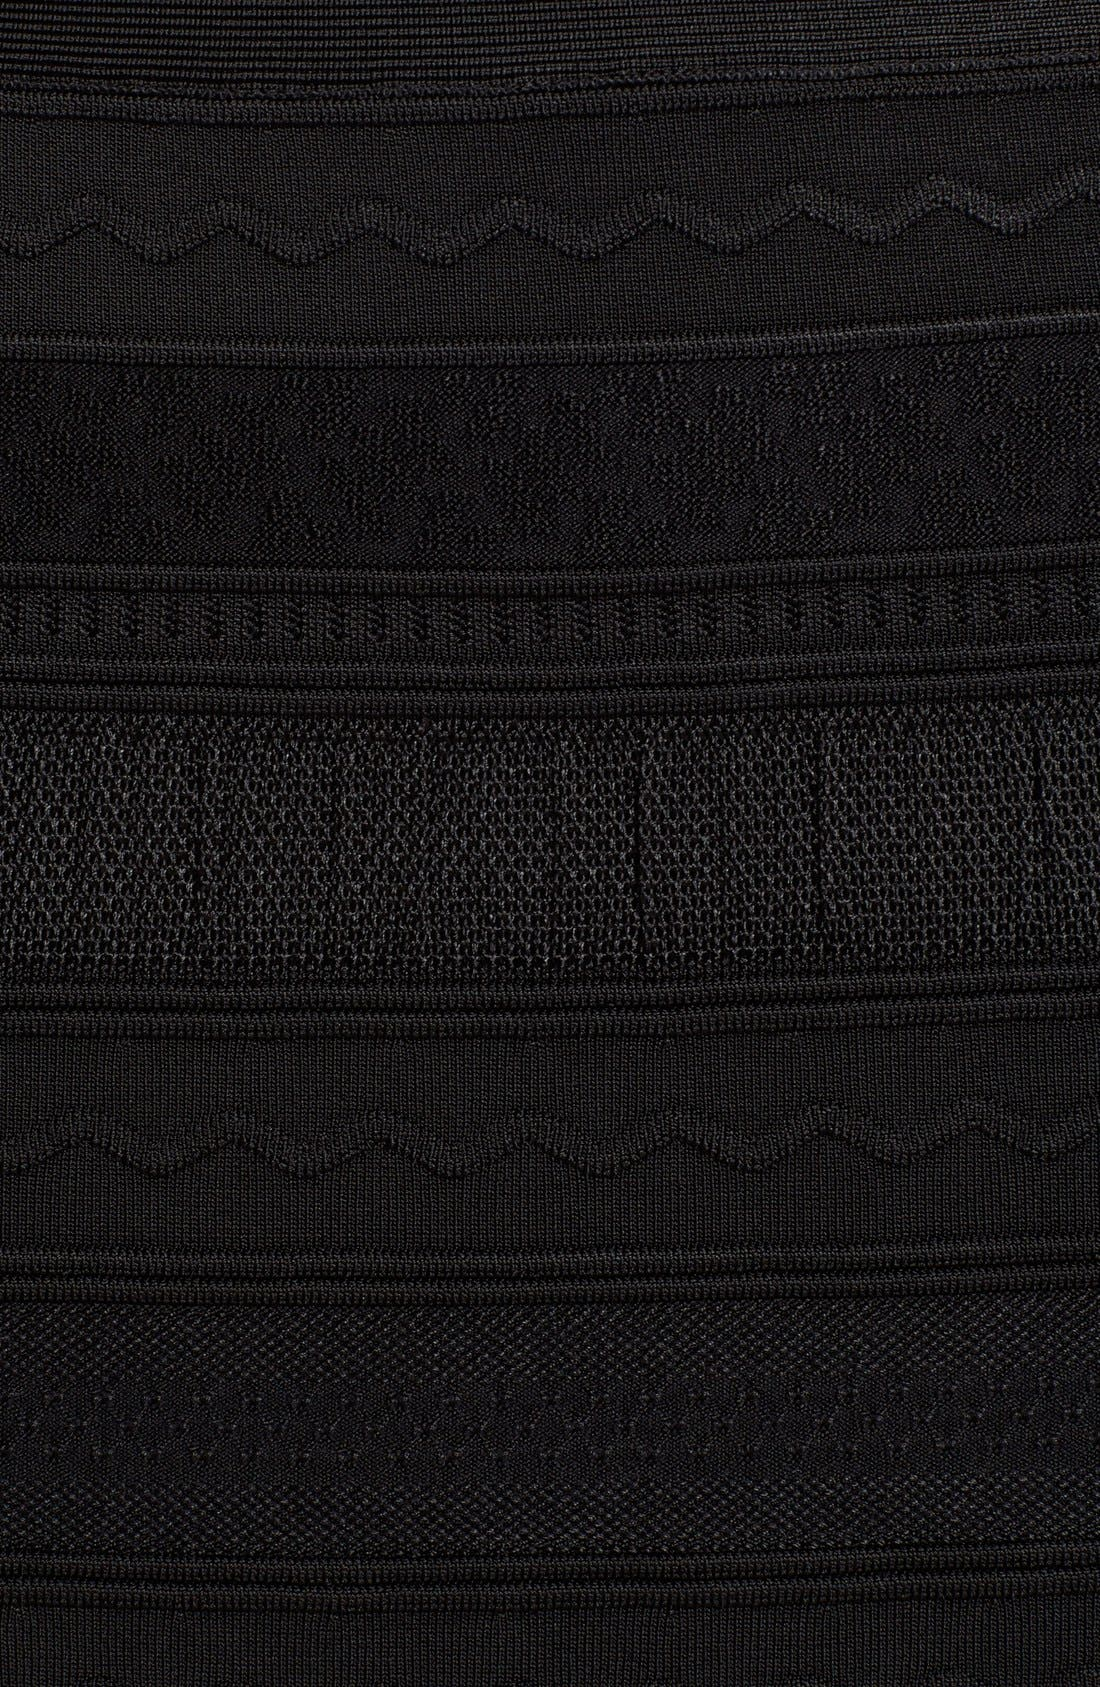 Alternate Image 3  - Herve Leger Mixed Stitch Bandage Gown